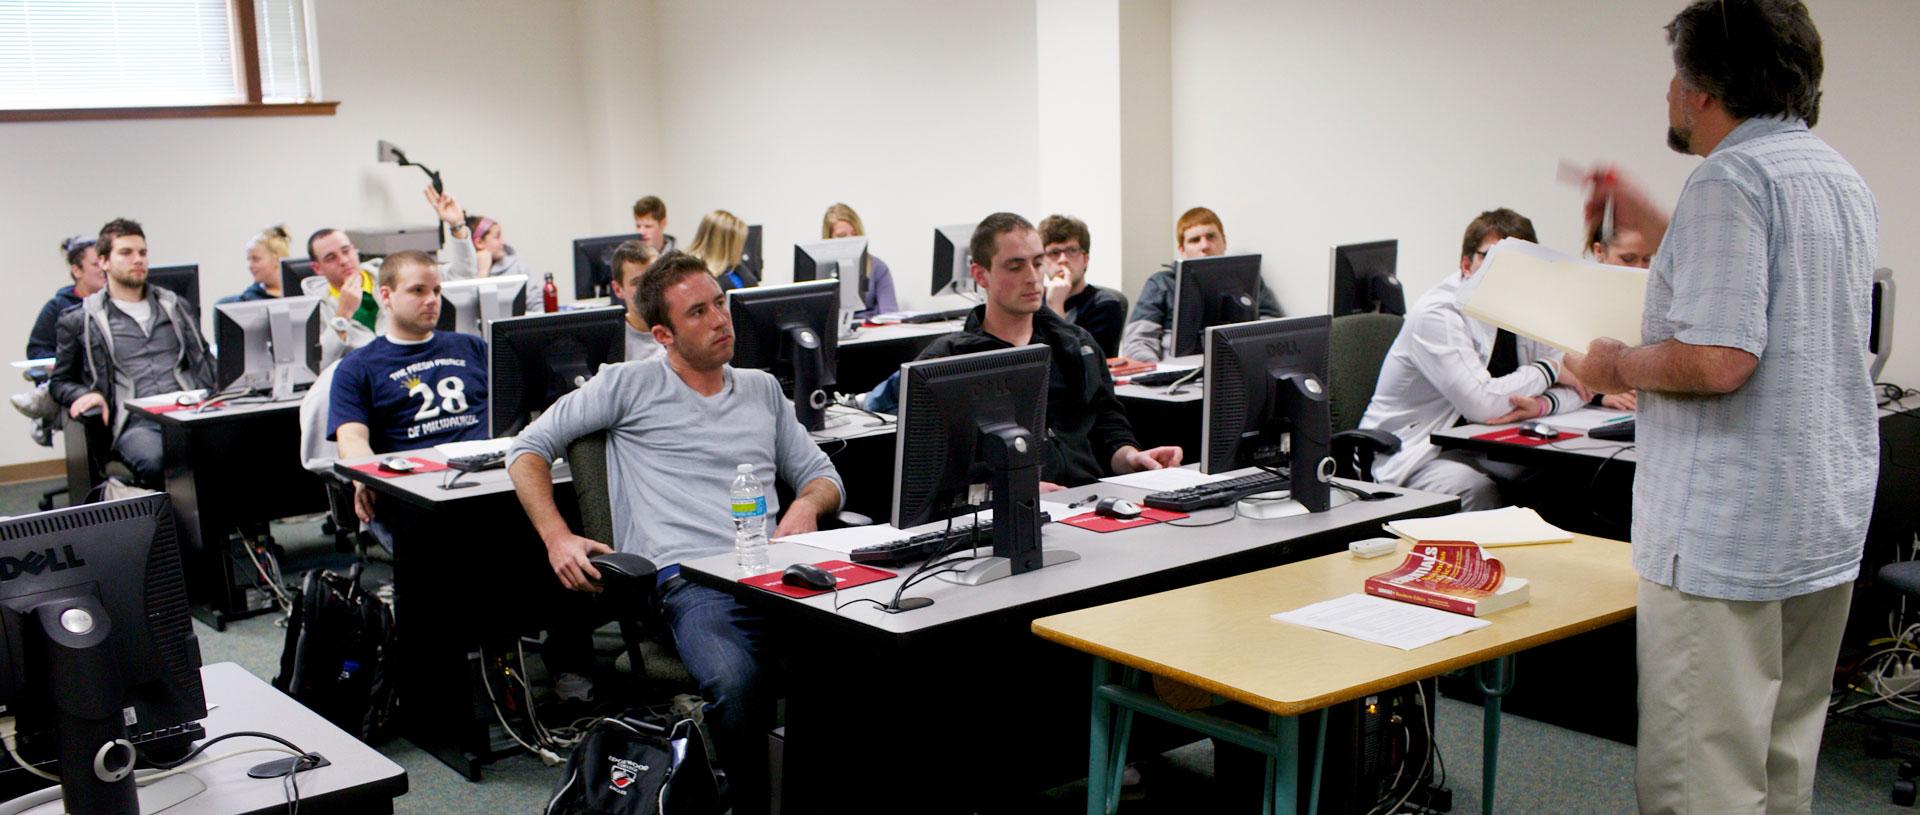 Undergrad Business CIS Class.